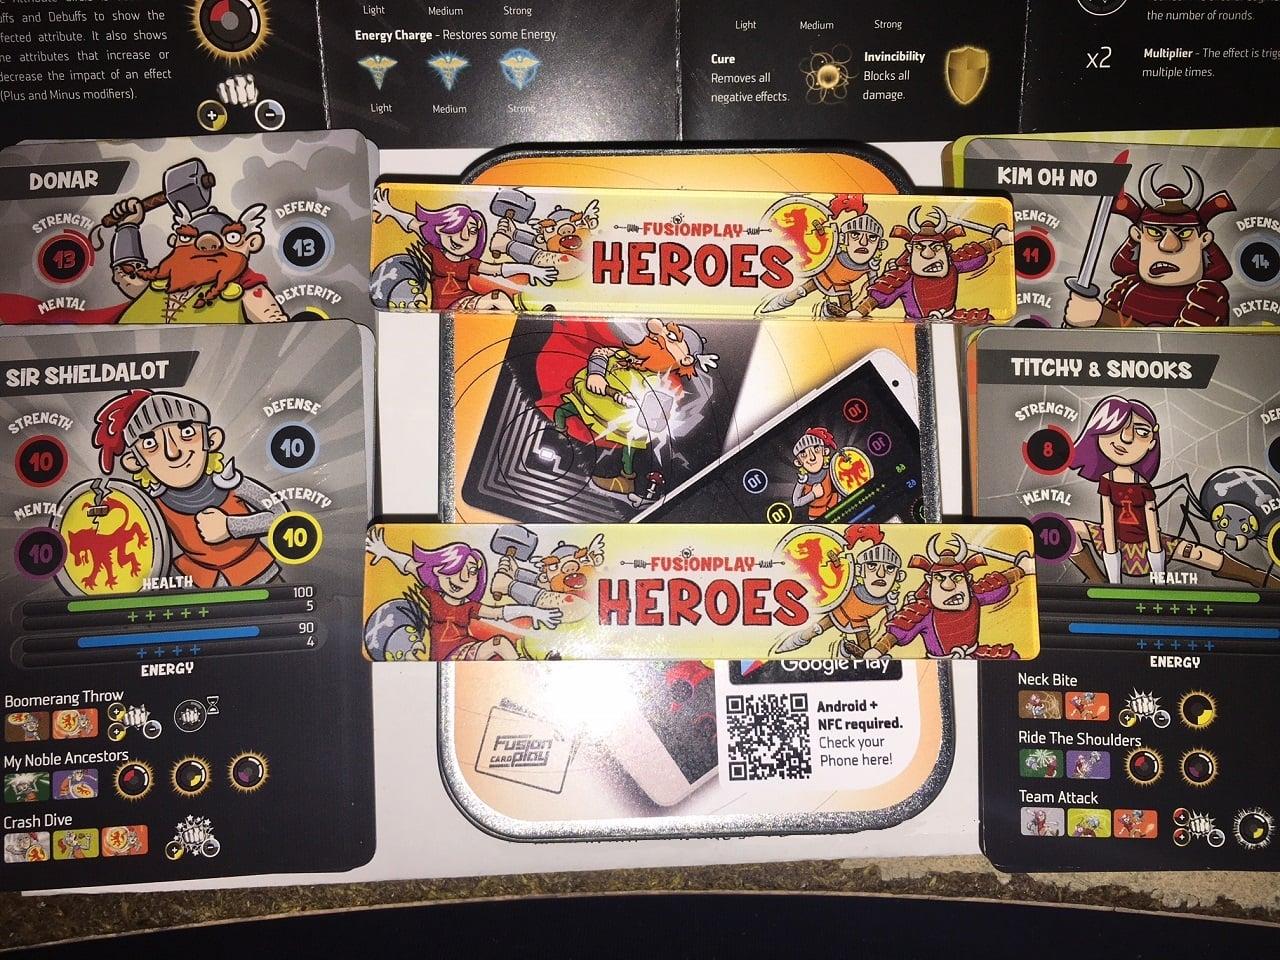 fusionplay heroes 2